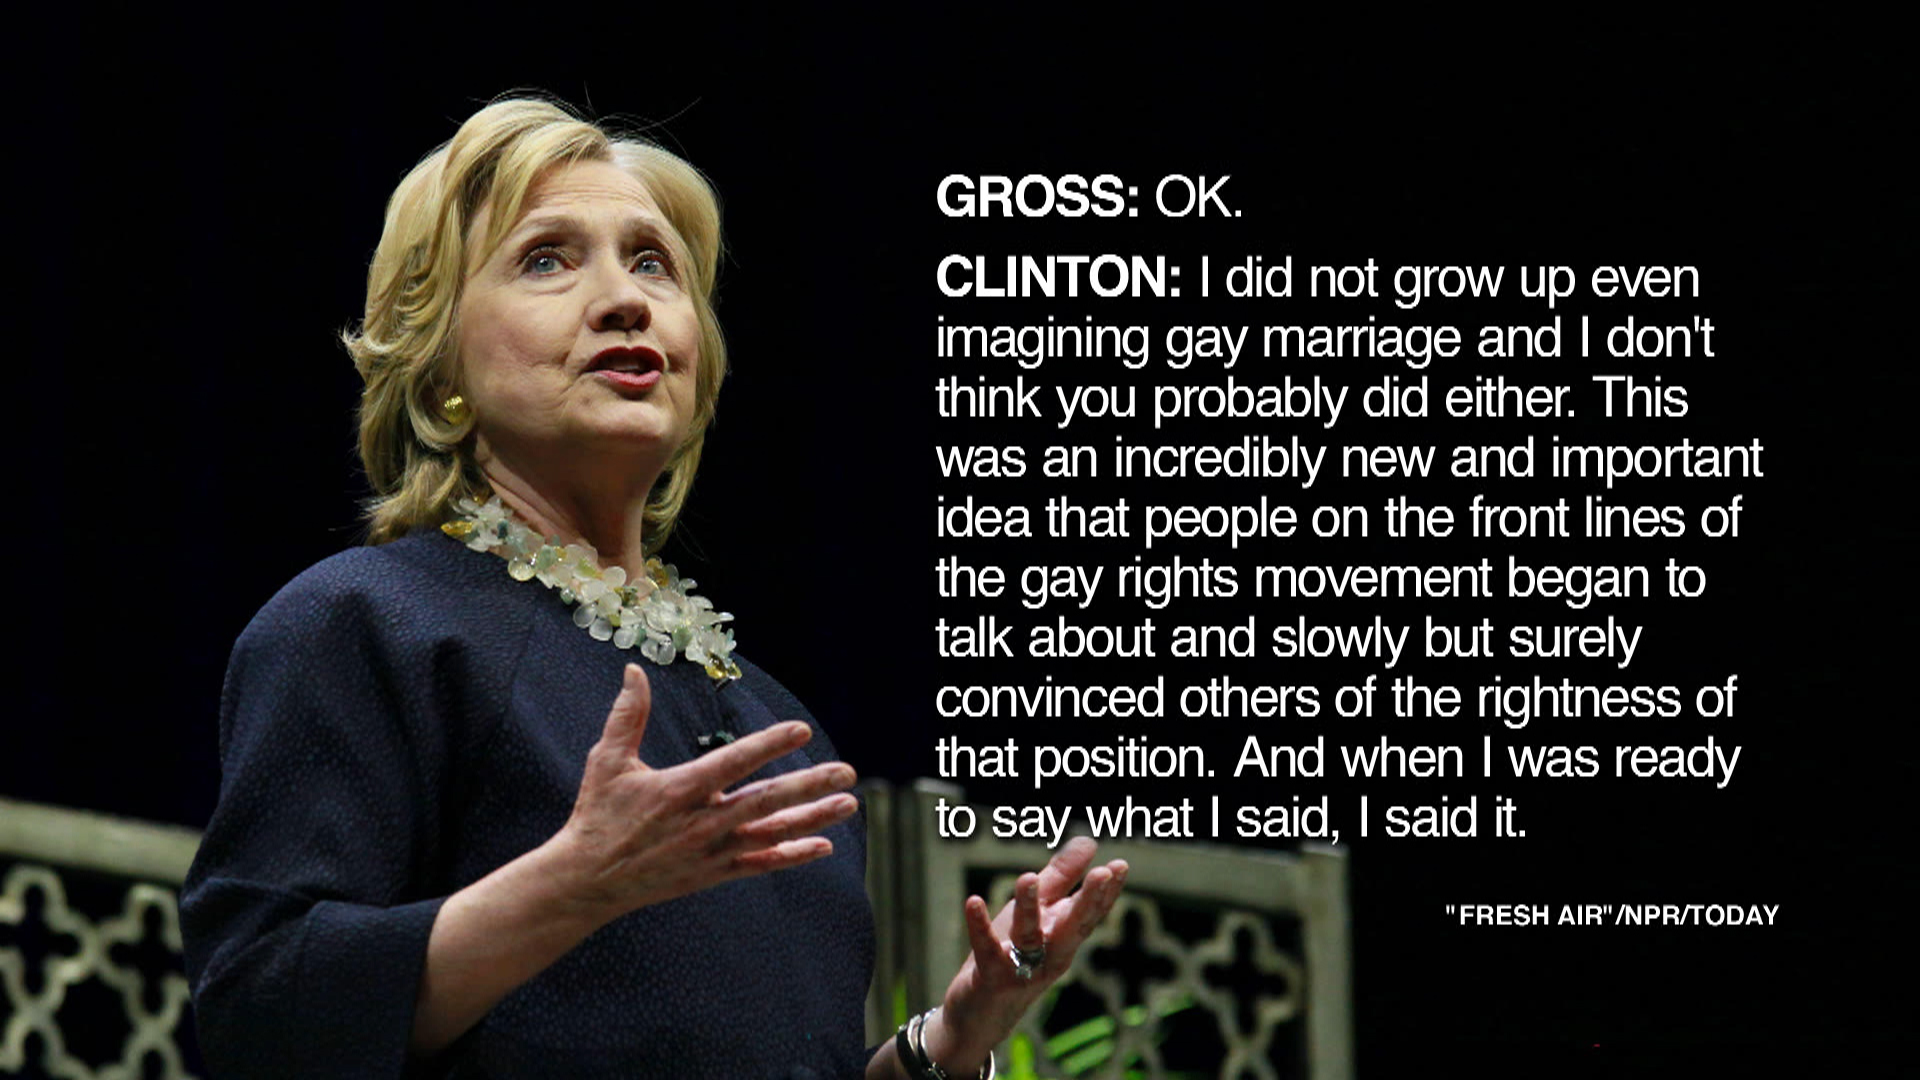 Hillary Clinton's awkward gay rights...